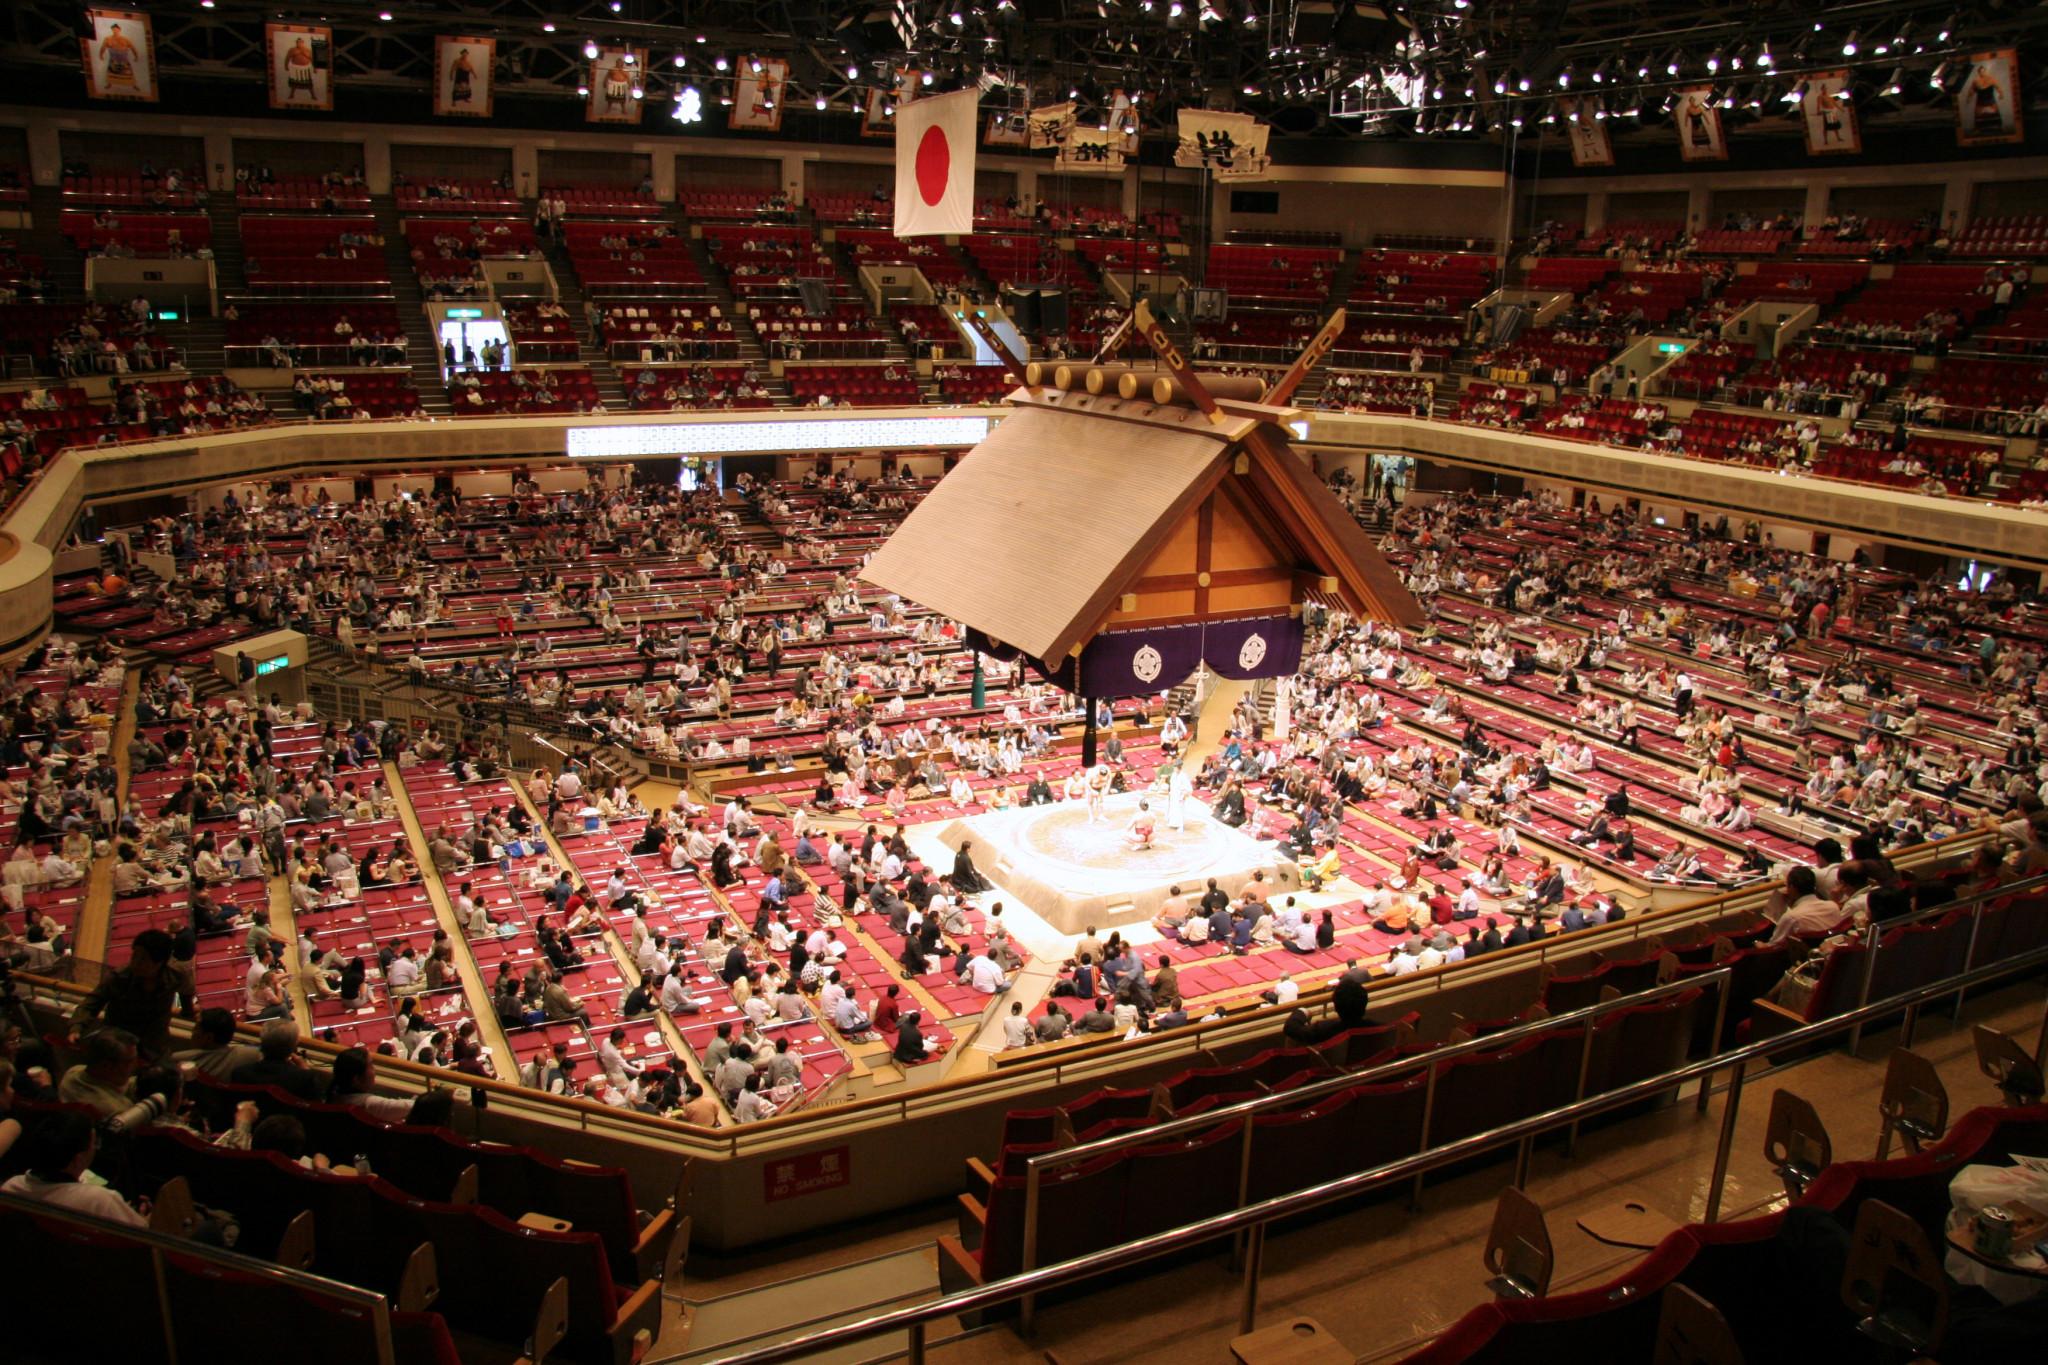 The sumo tournament will take place at Tokyo's Ryogoku Kokugikan Sumo Arena ©Wikipedia